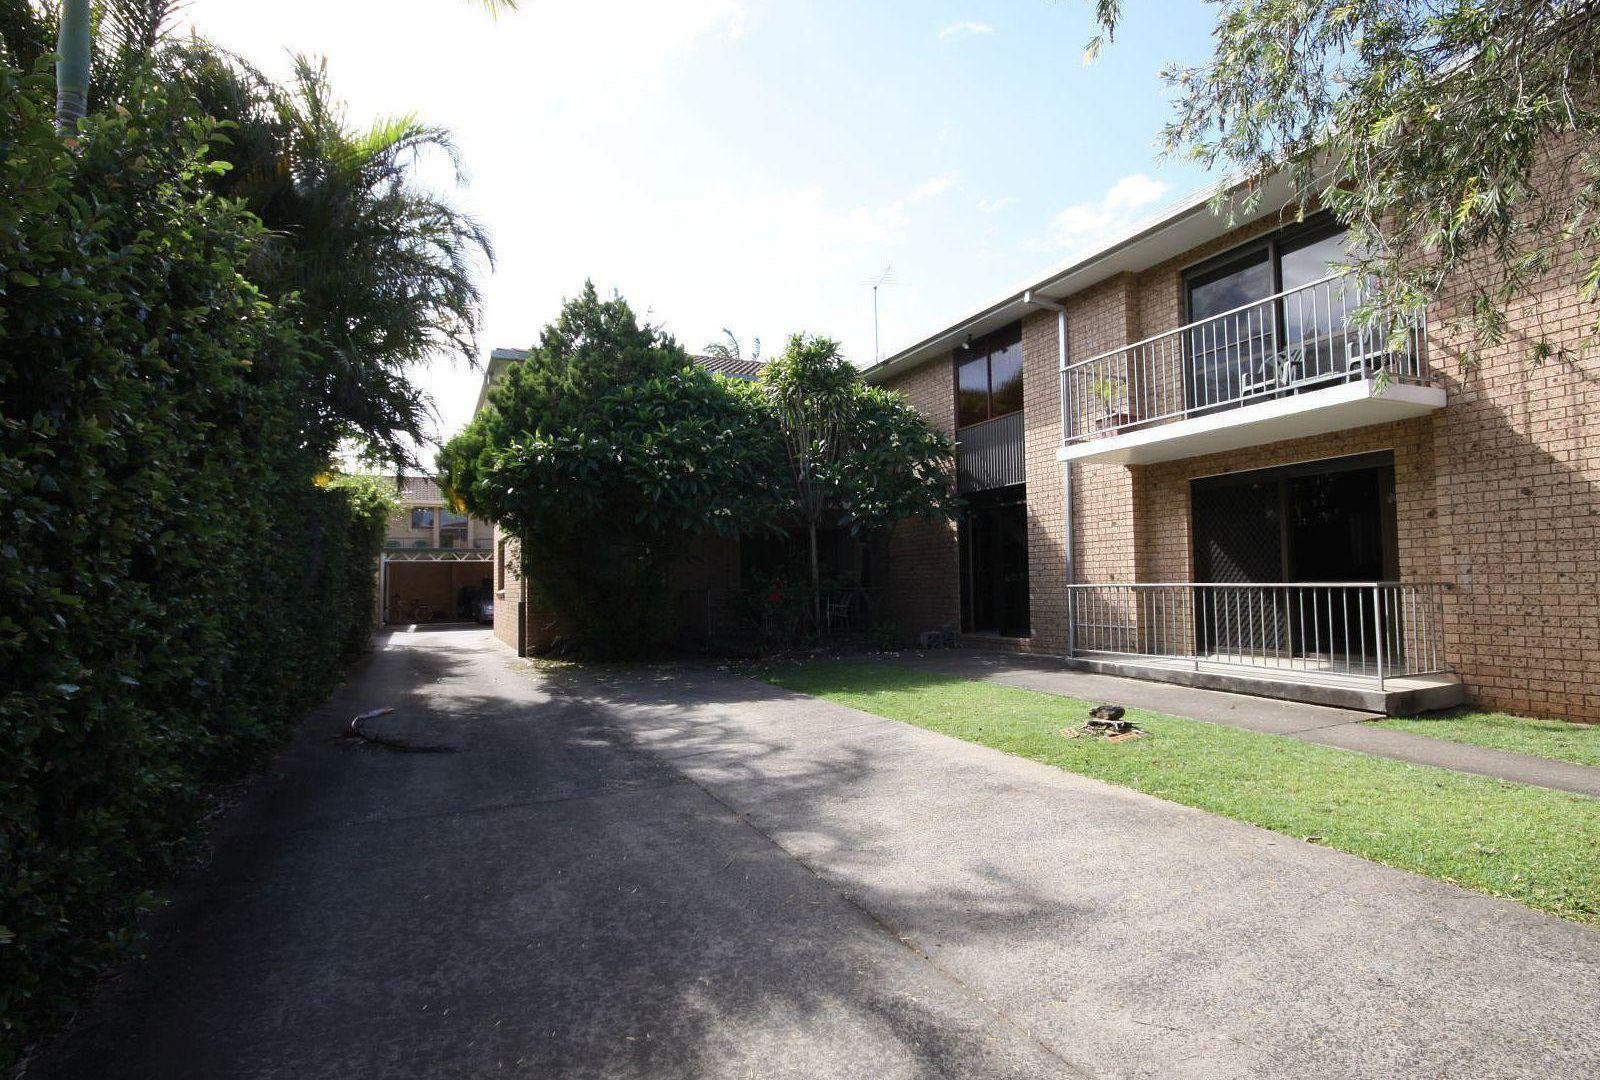 5/91 Martin Street, Ballina NSW 2478, Image 7